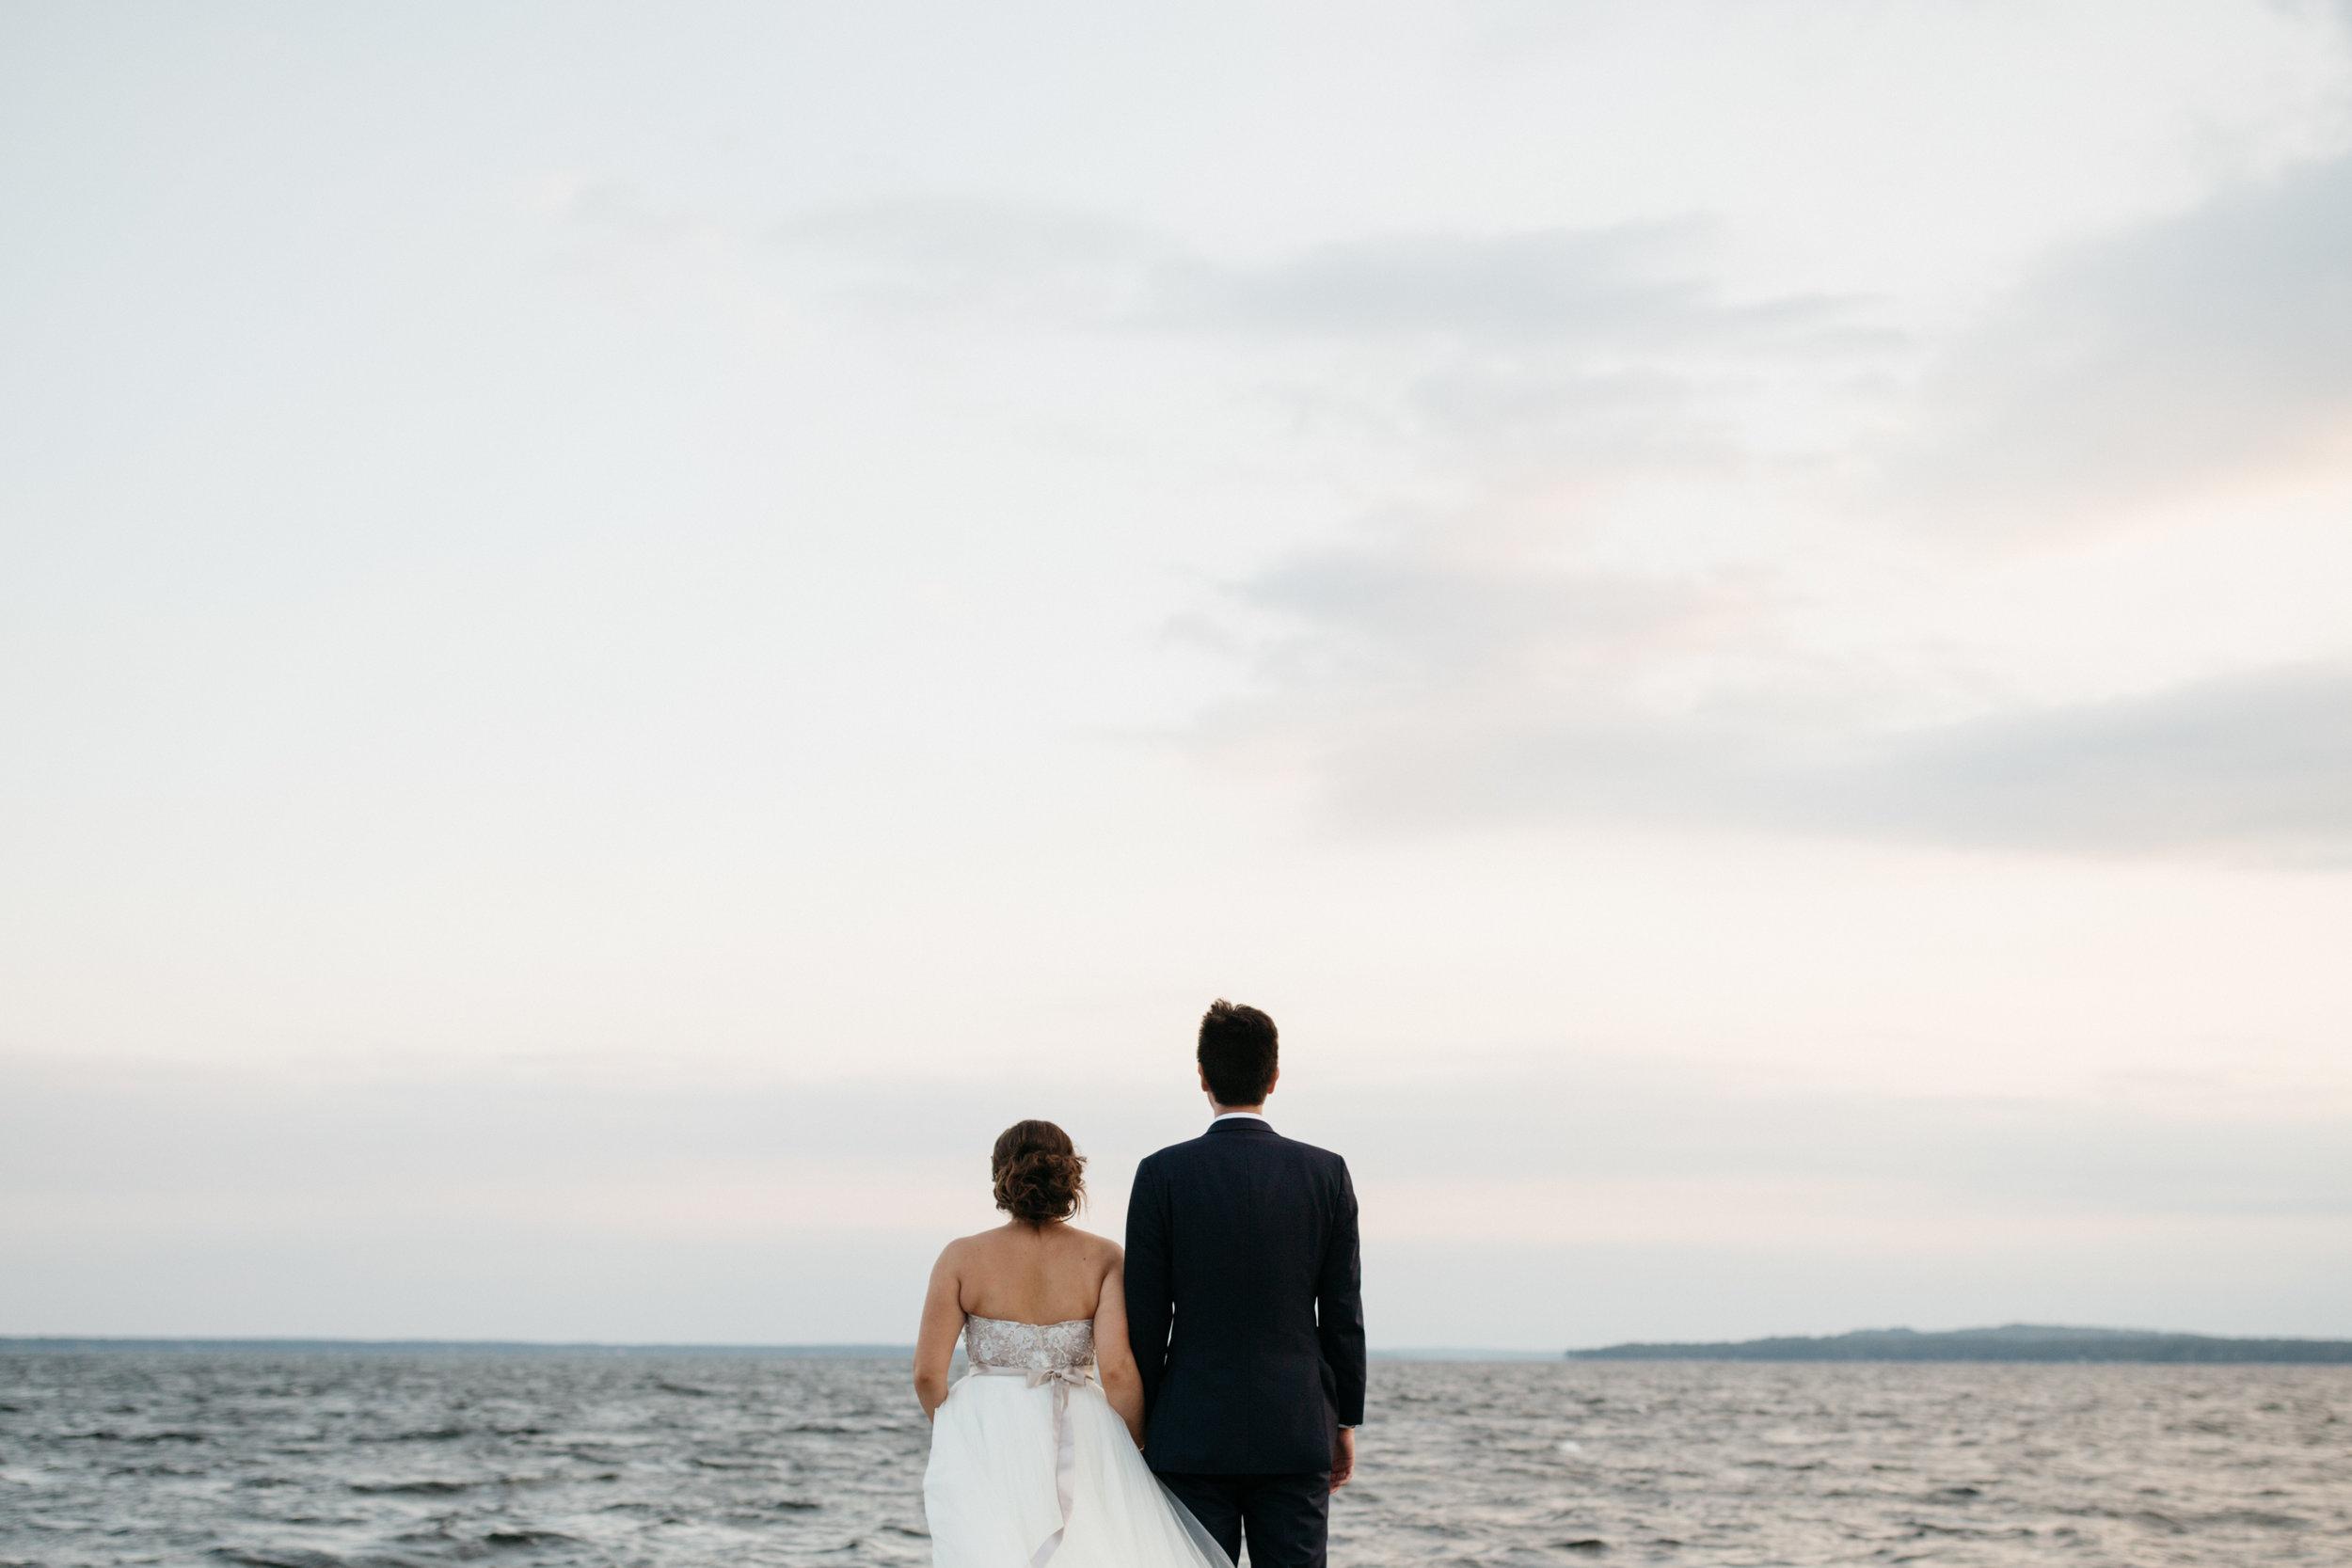 Minimalism wedding photography by Britt DeZeeuw at Grand View Lodge